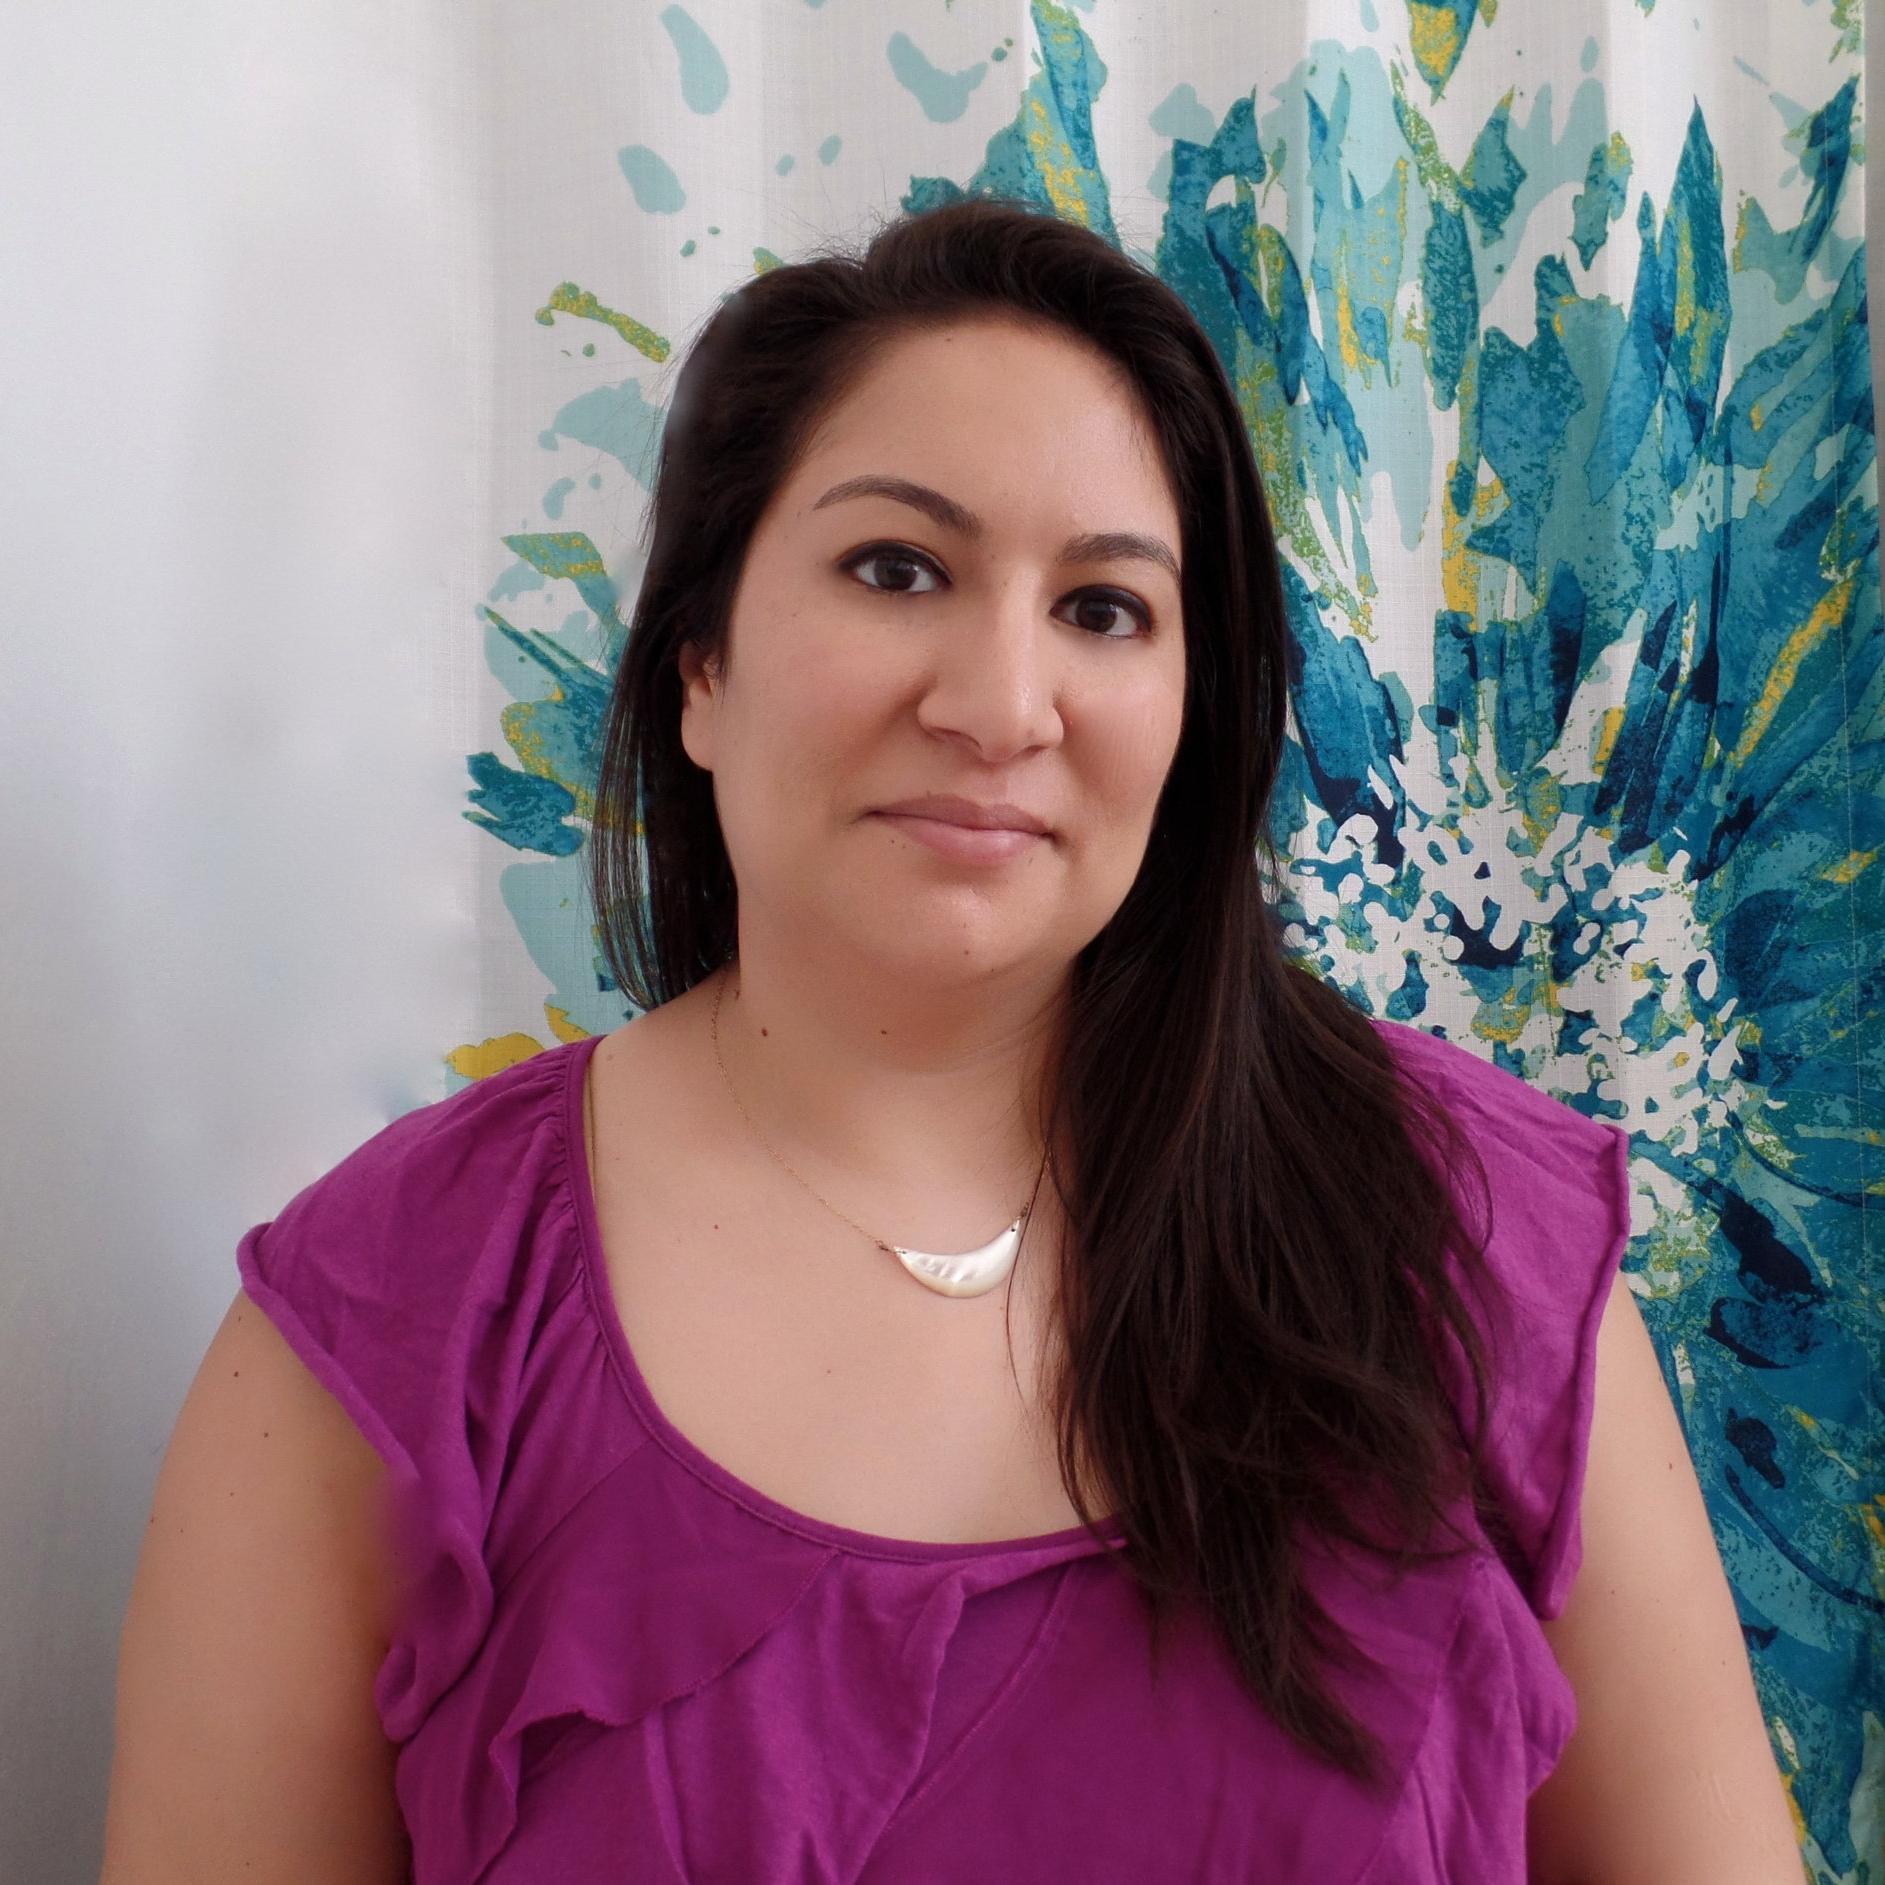 SAM_2196 Vanessa Erazo Headshot 1.jpg